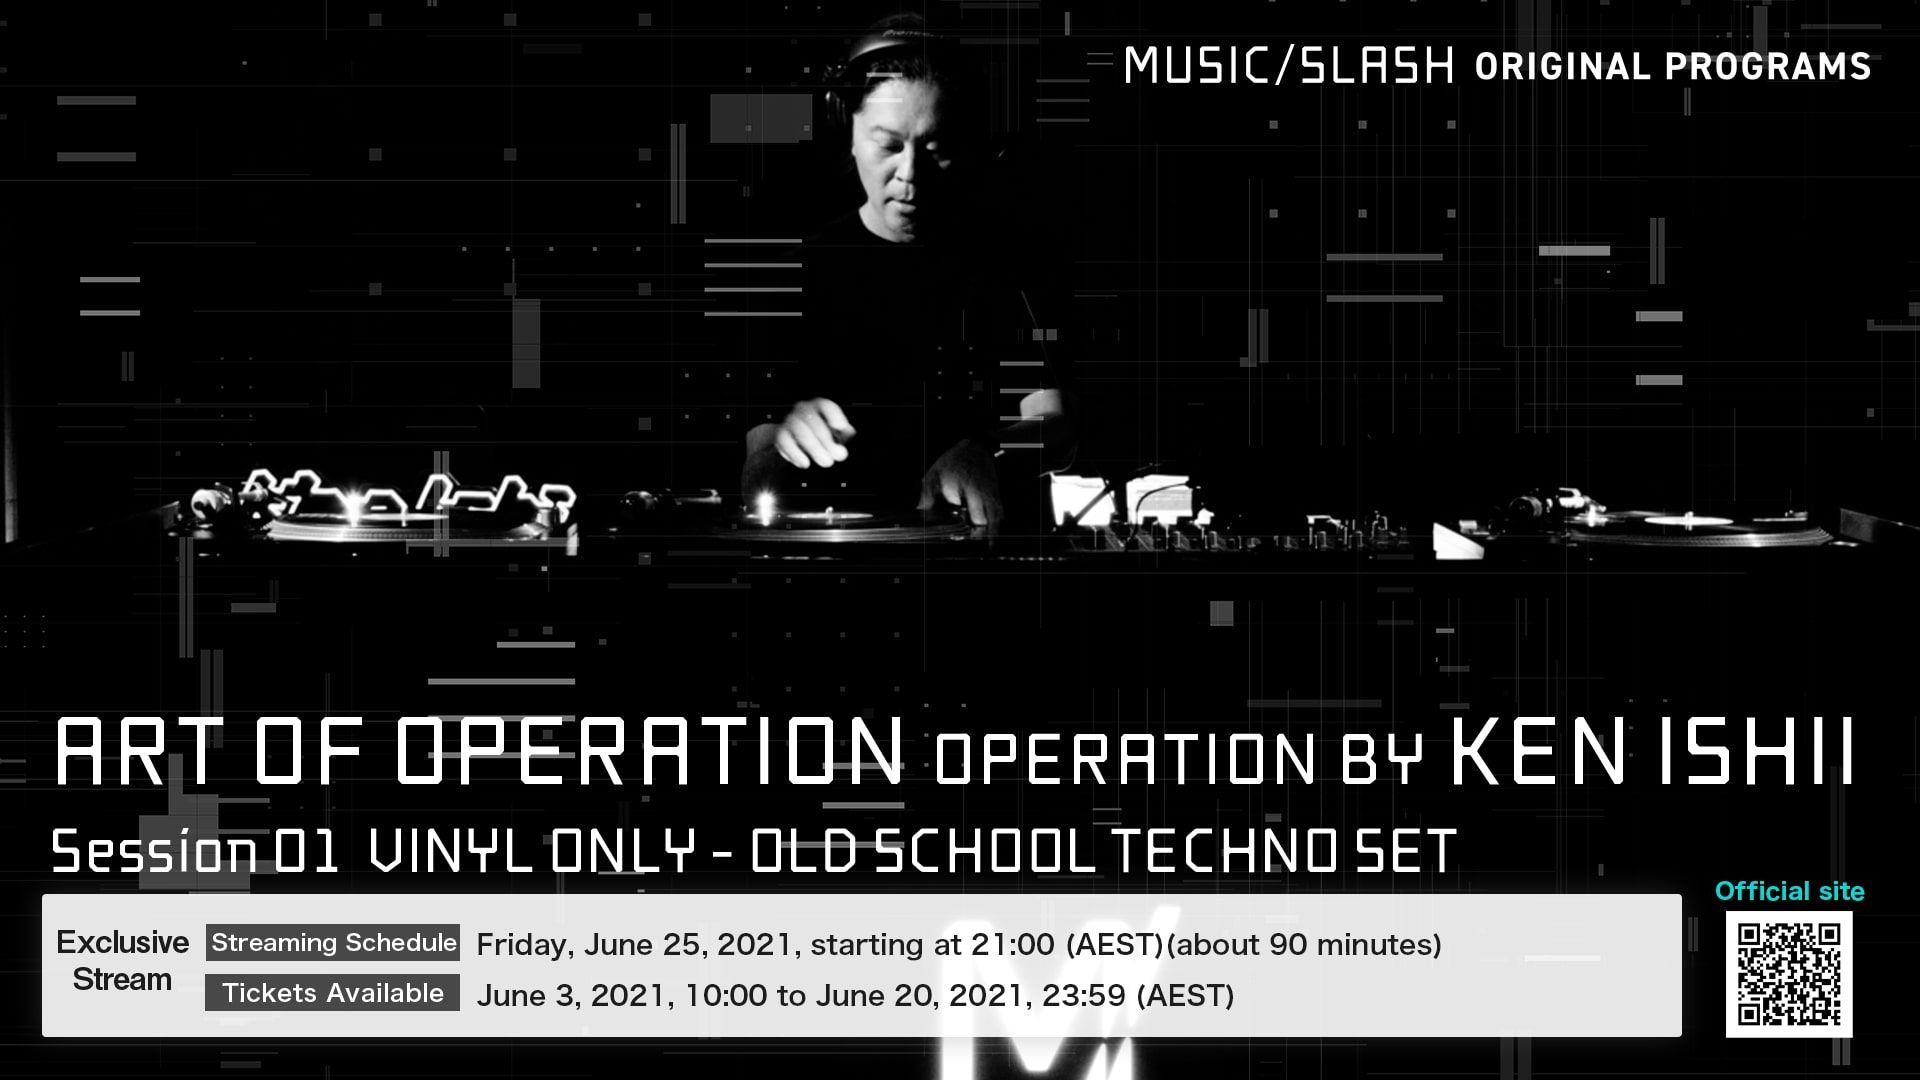 [MUSIC/SLASH] KEN ISHII / ART OF OPERATION VINYL ONLY - OLD SCHOOL TECHNO SET Session 01